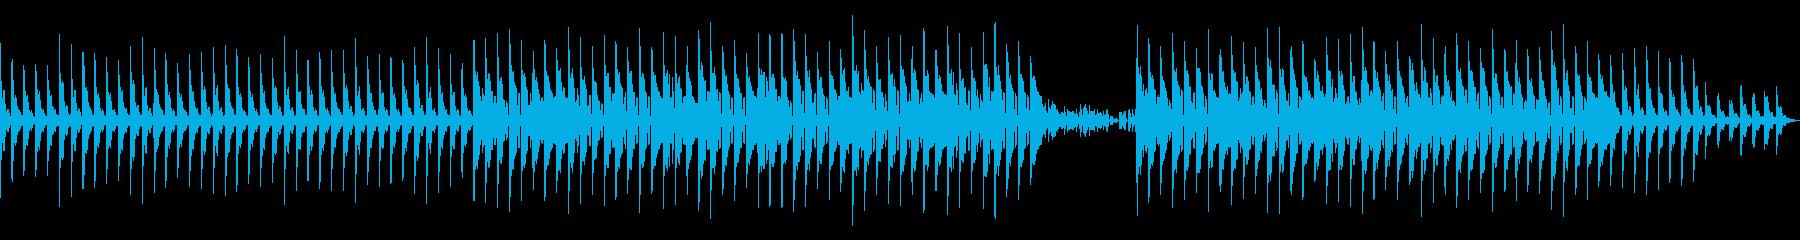 bpm128ドラムなしバージョンの再生済みの波形